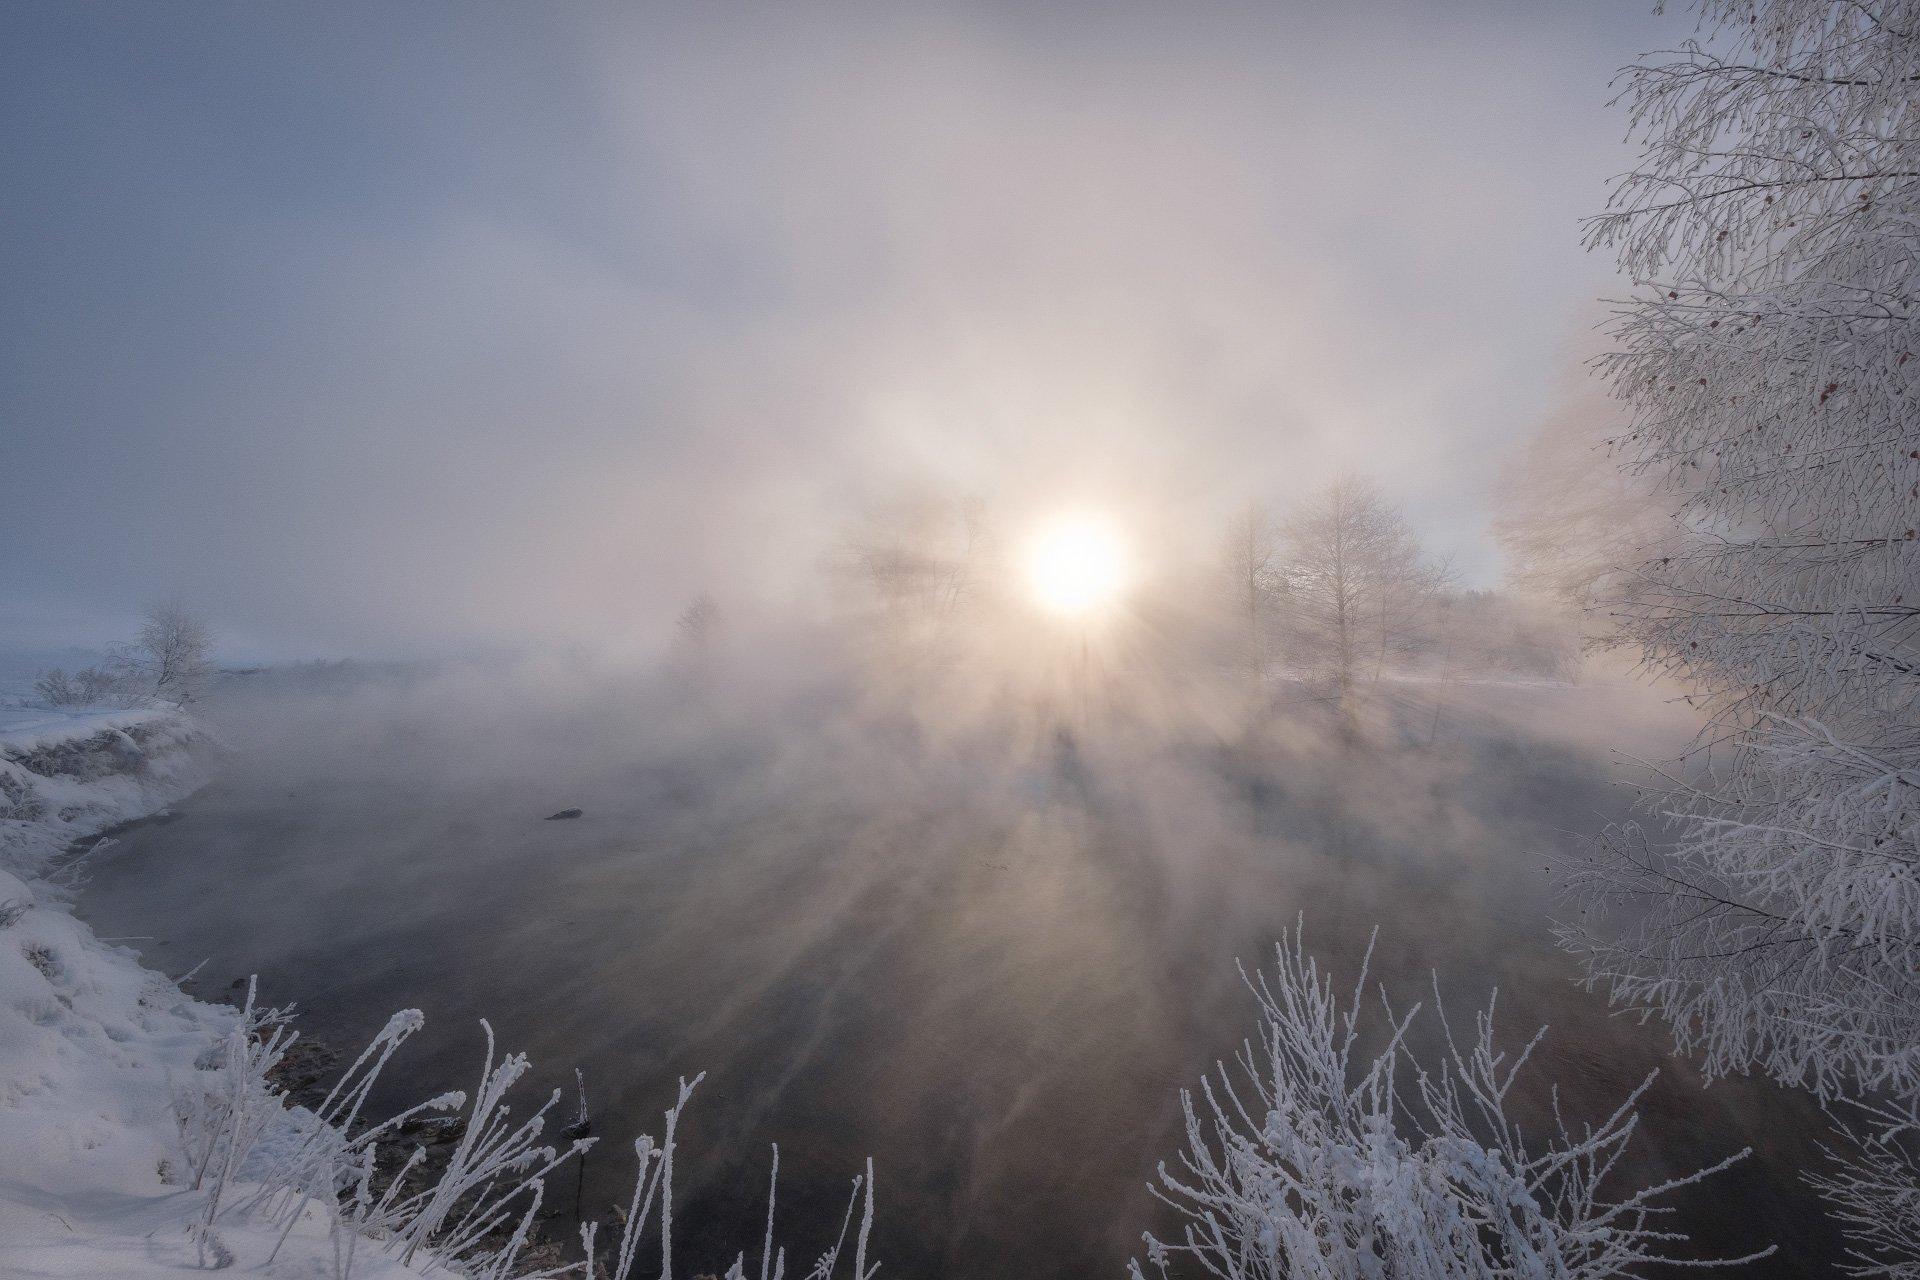 пехорка, река, пейзаж, зима, мороз, январь, туман, пар, иней, снег, лед, деревья, Андрей Чиж